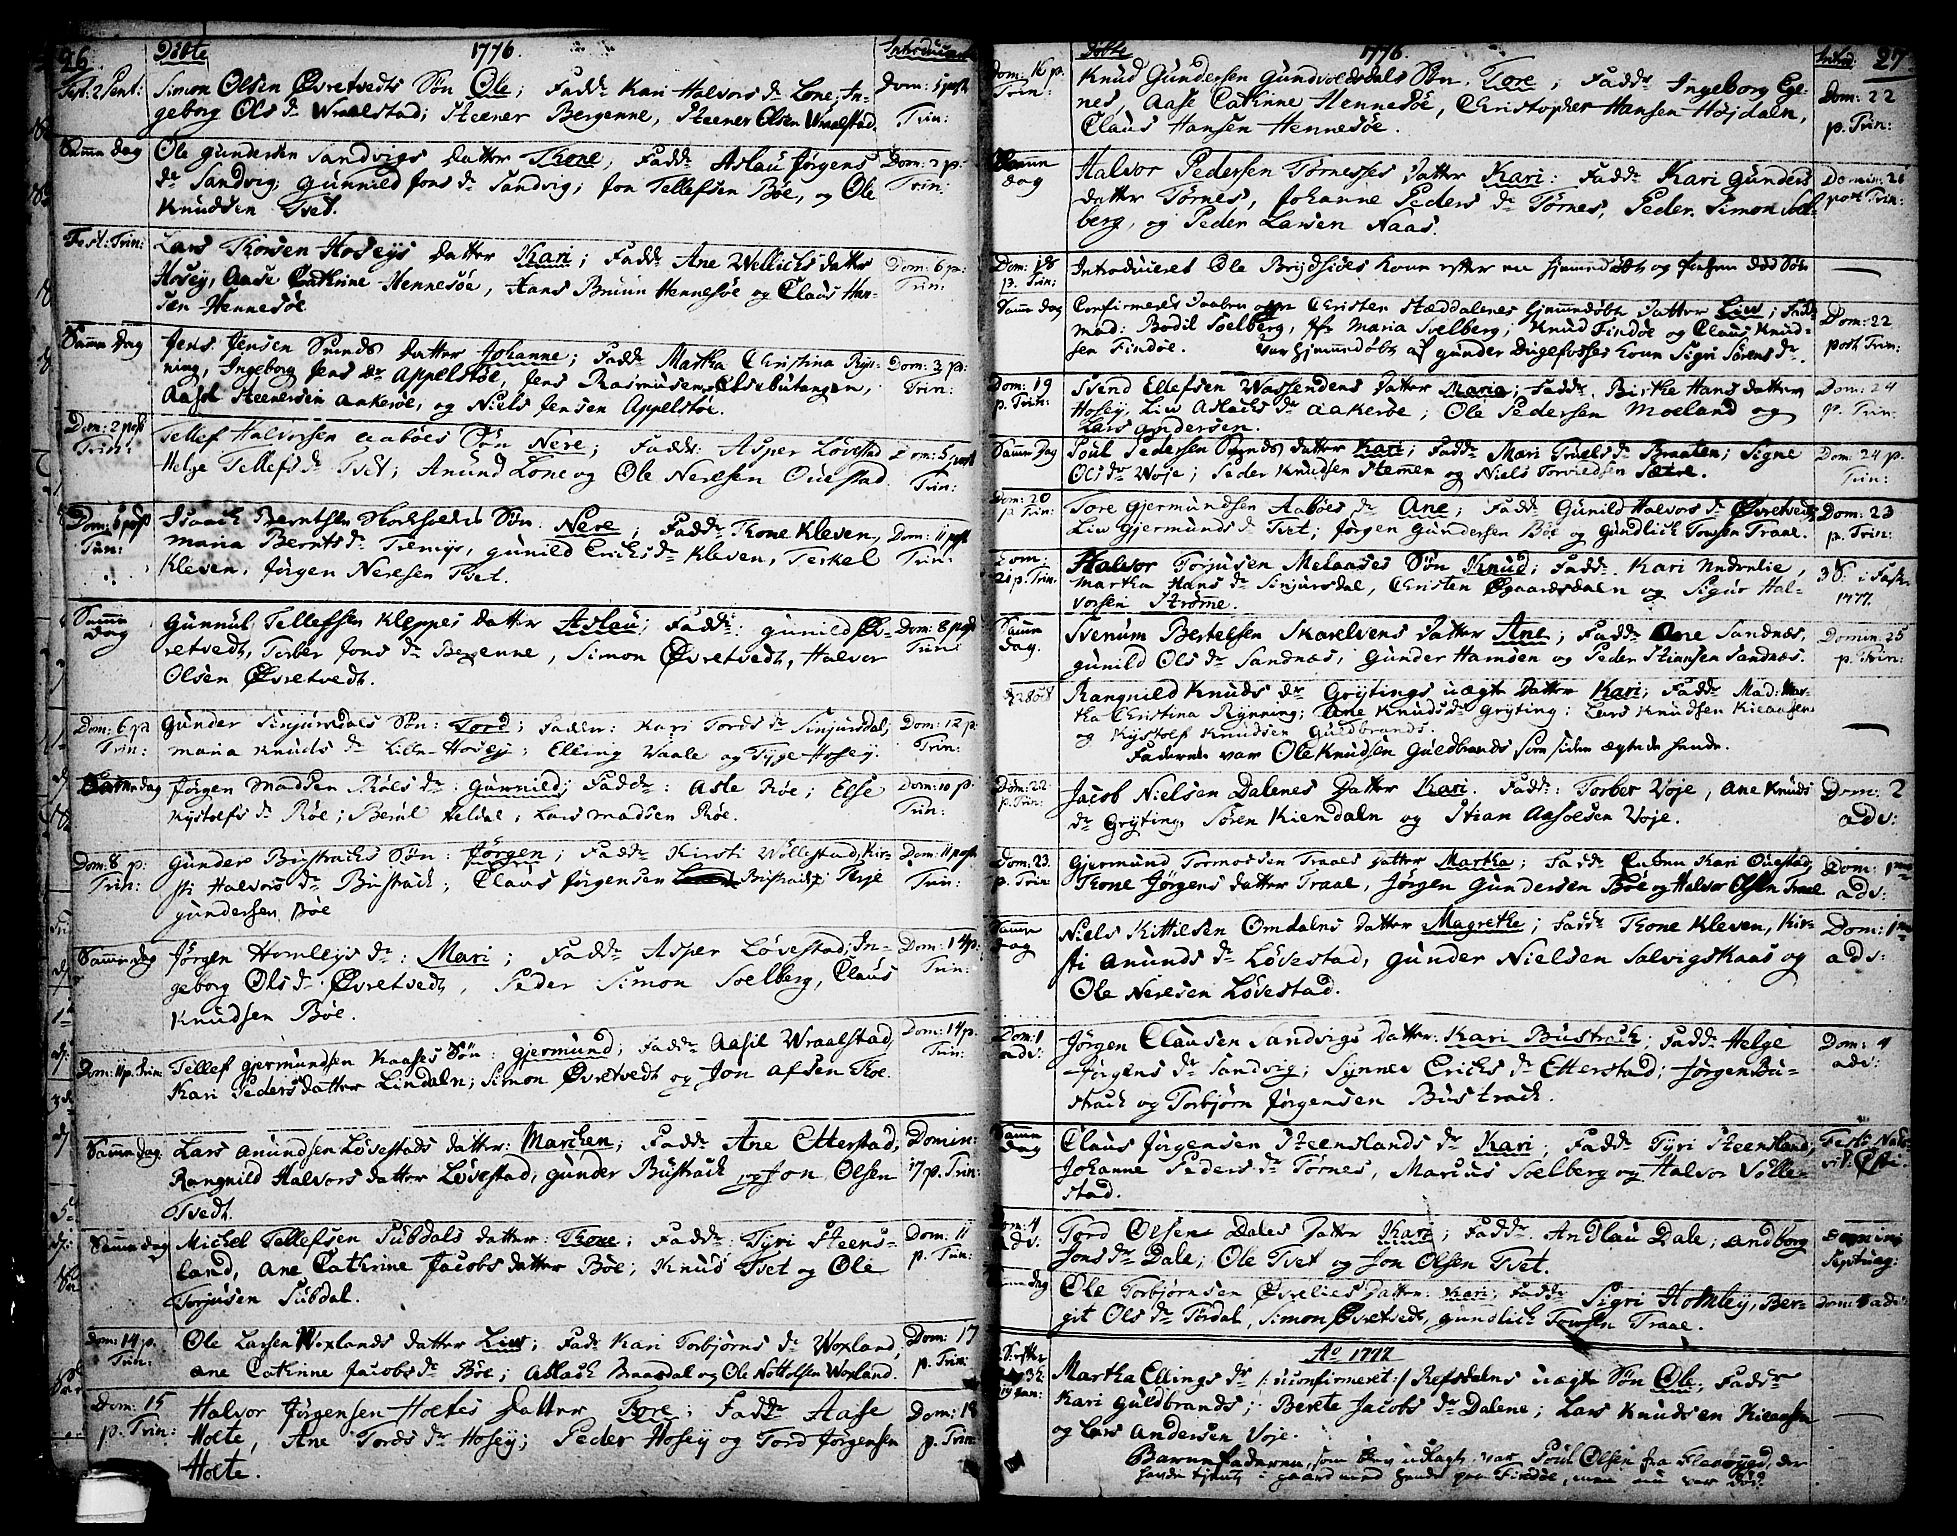 SAKO, Drangedal kirkebøker, F/Fa/L0003: Ministerialbok nr. 3, 1768-1814, s. 26-27